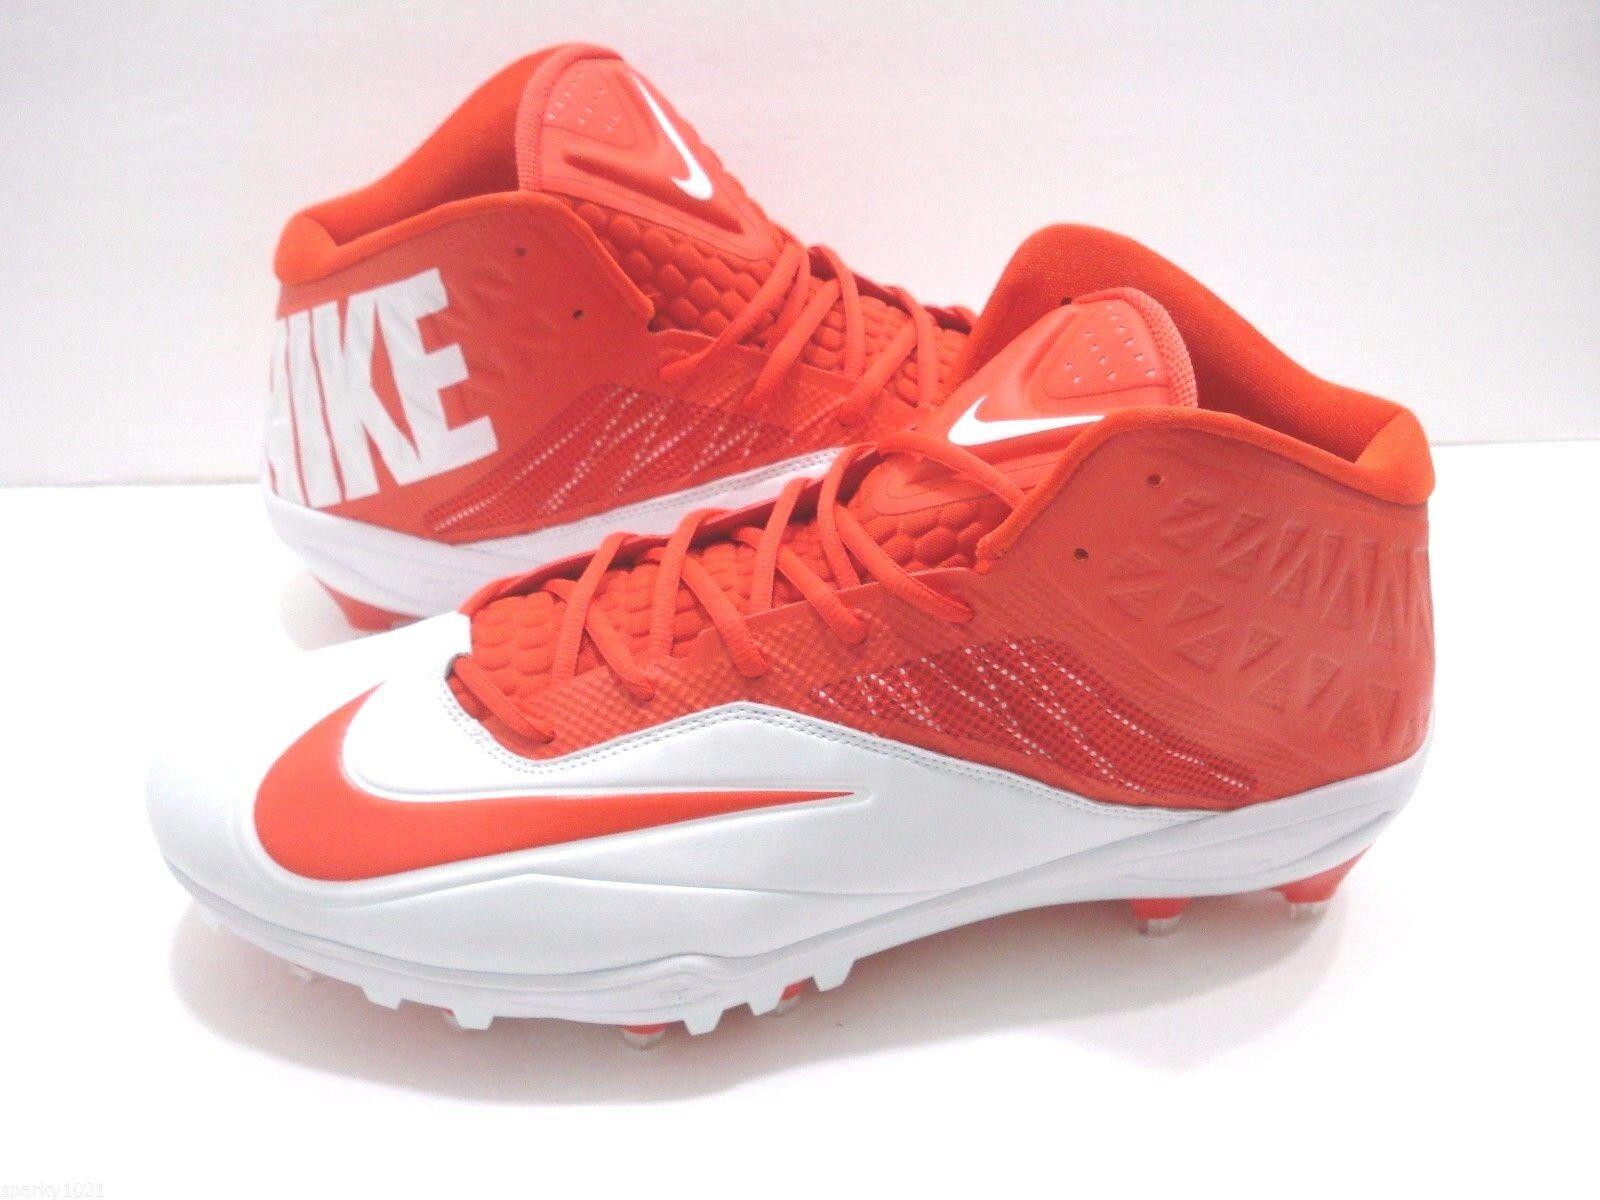 Nike 3/4 homme Zoom Code Elite 3/4 Nike TD Football Cleats/chaussures dae7e6